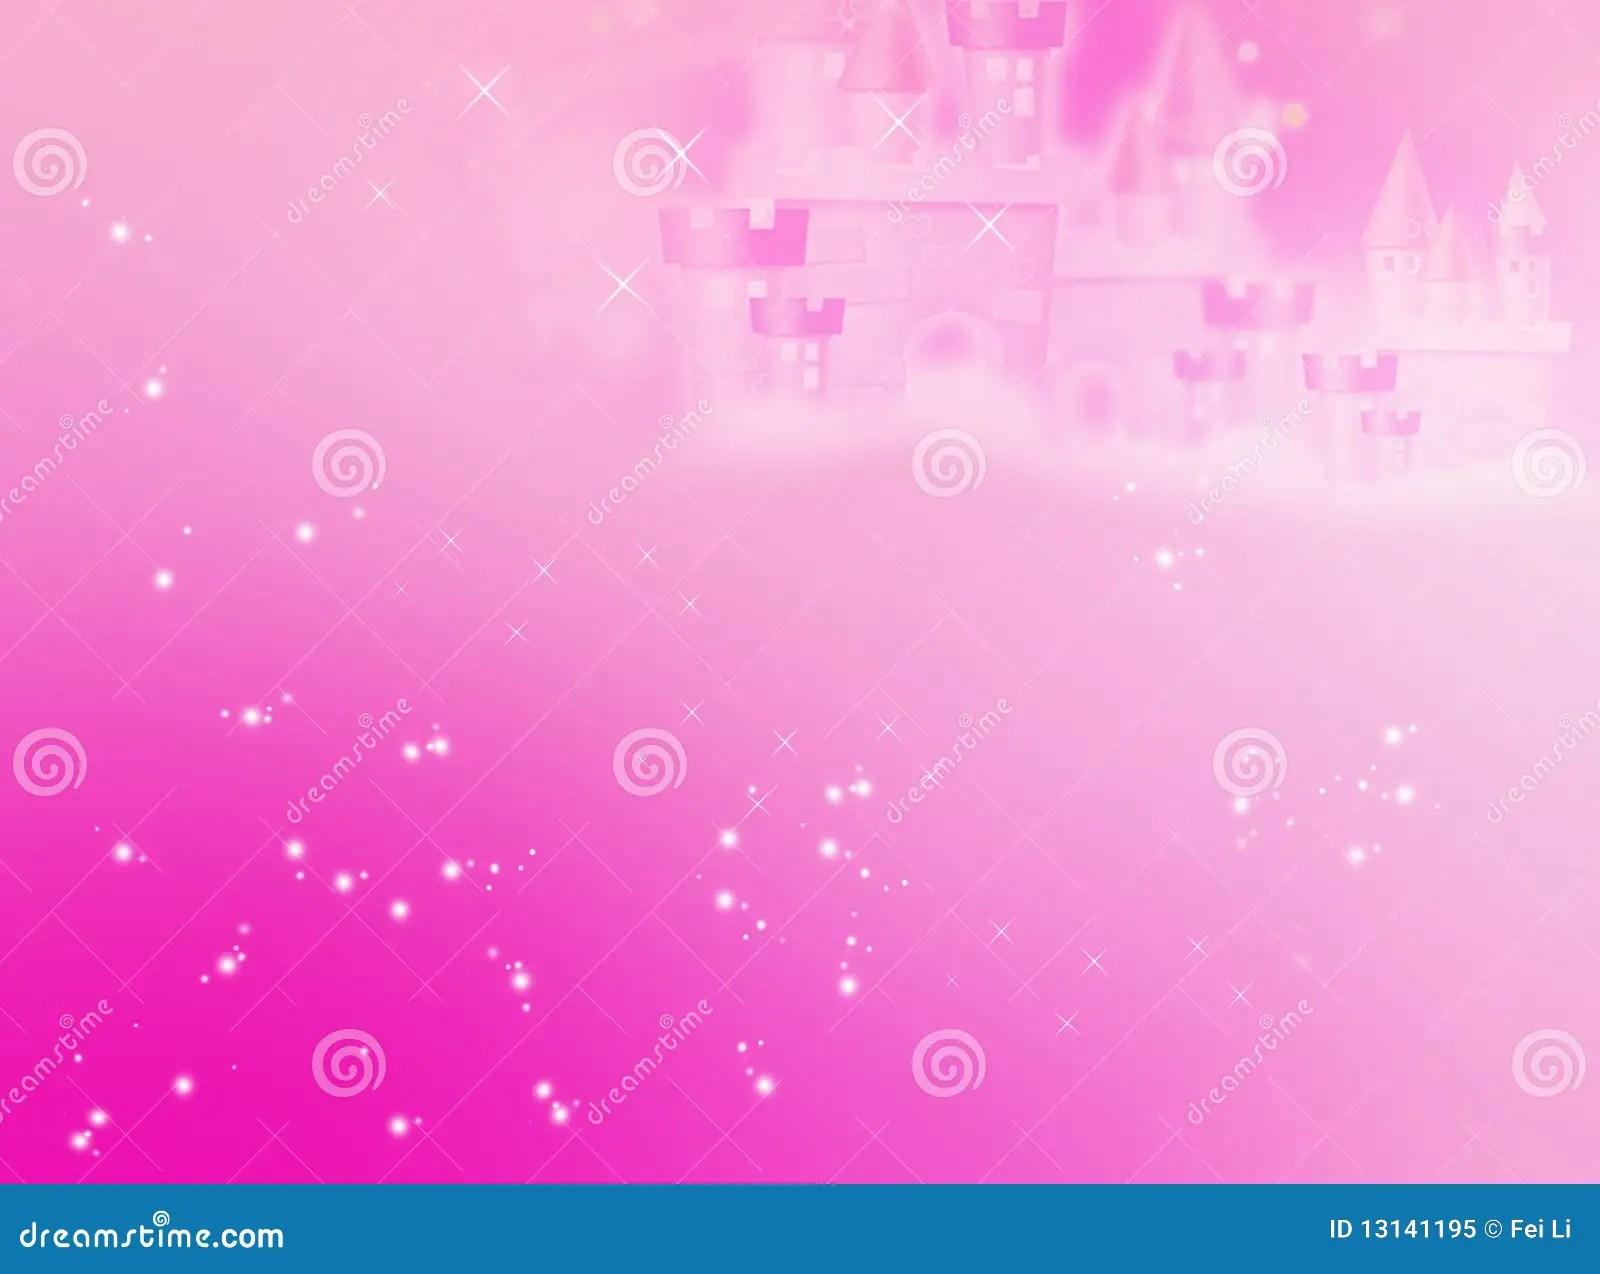 Falling Stars Gif Wallpaper Pink Background Royalty Free Stock Photo Image 13141195